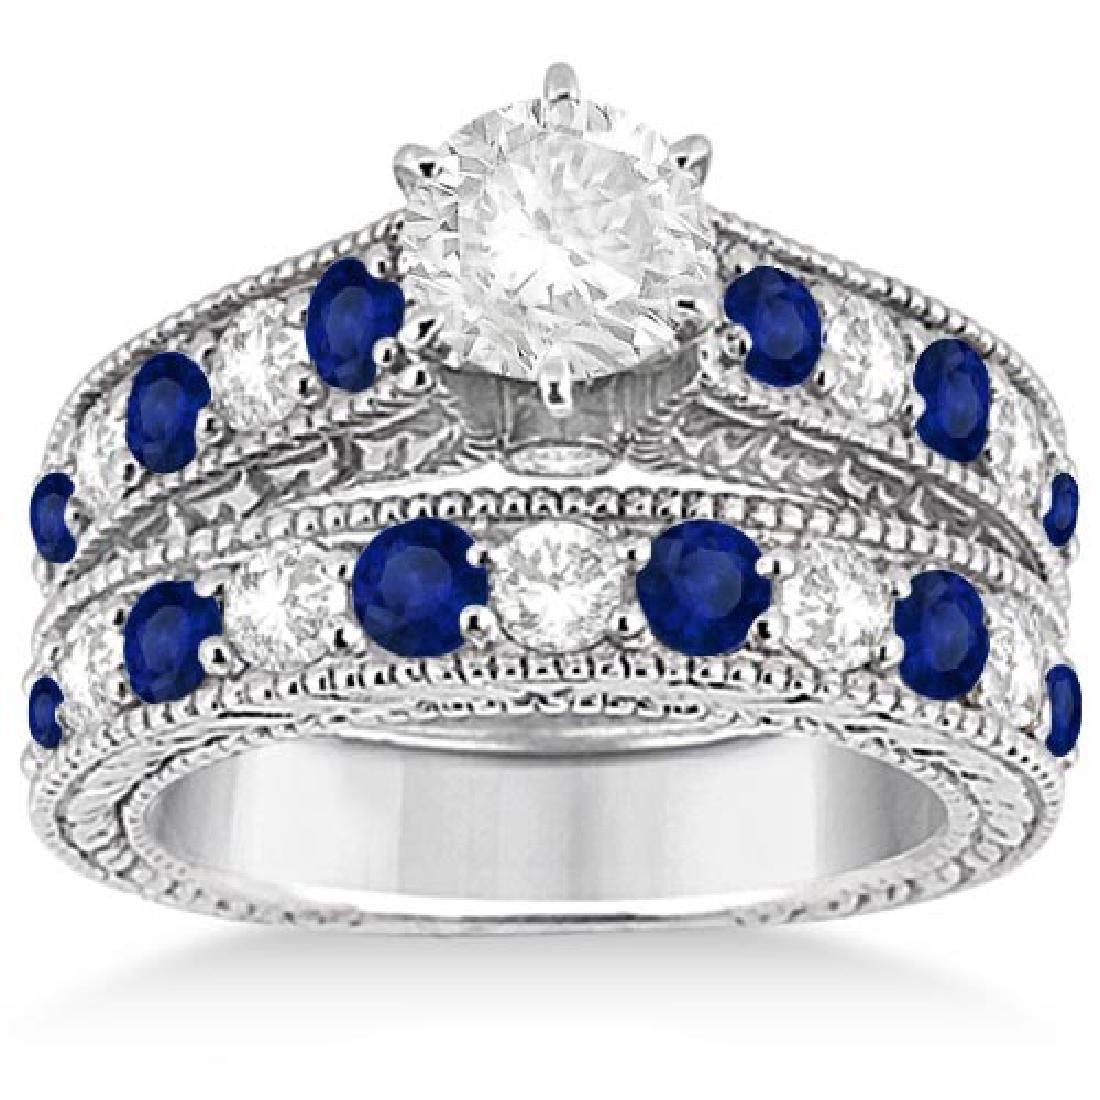 Antique Diamond and Sapphire Bridal Ring Set 14k White